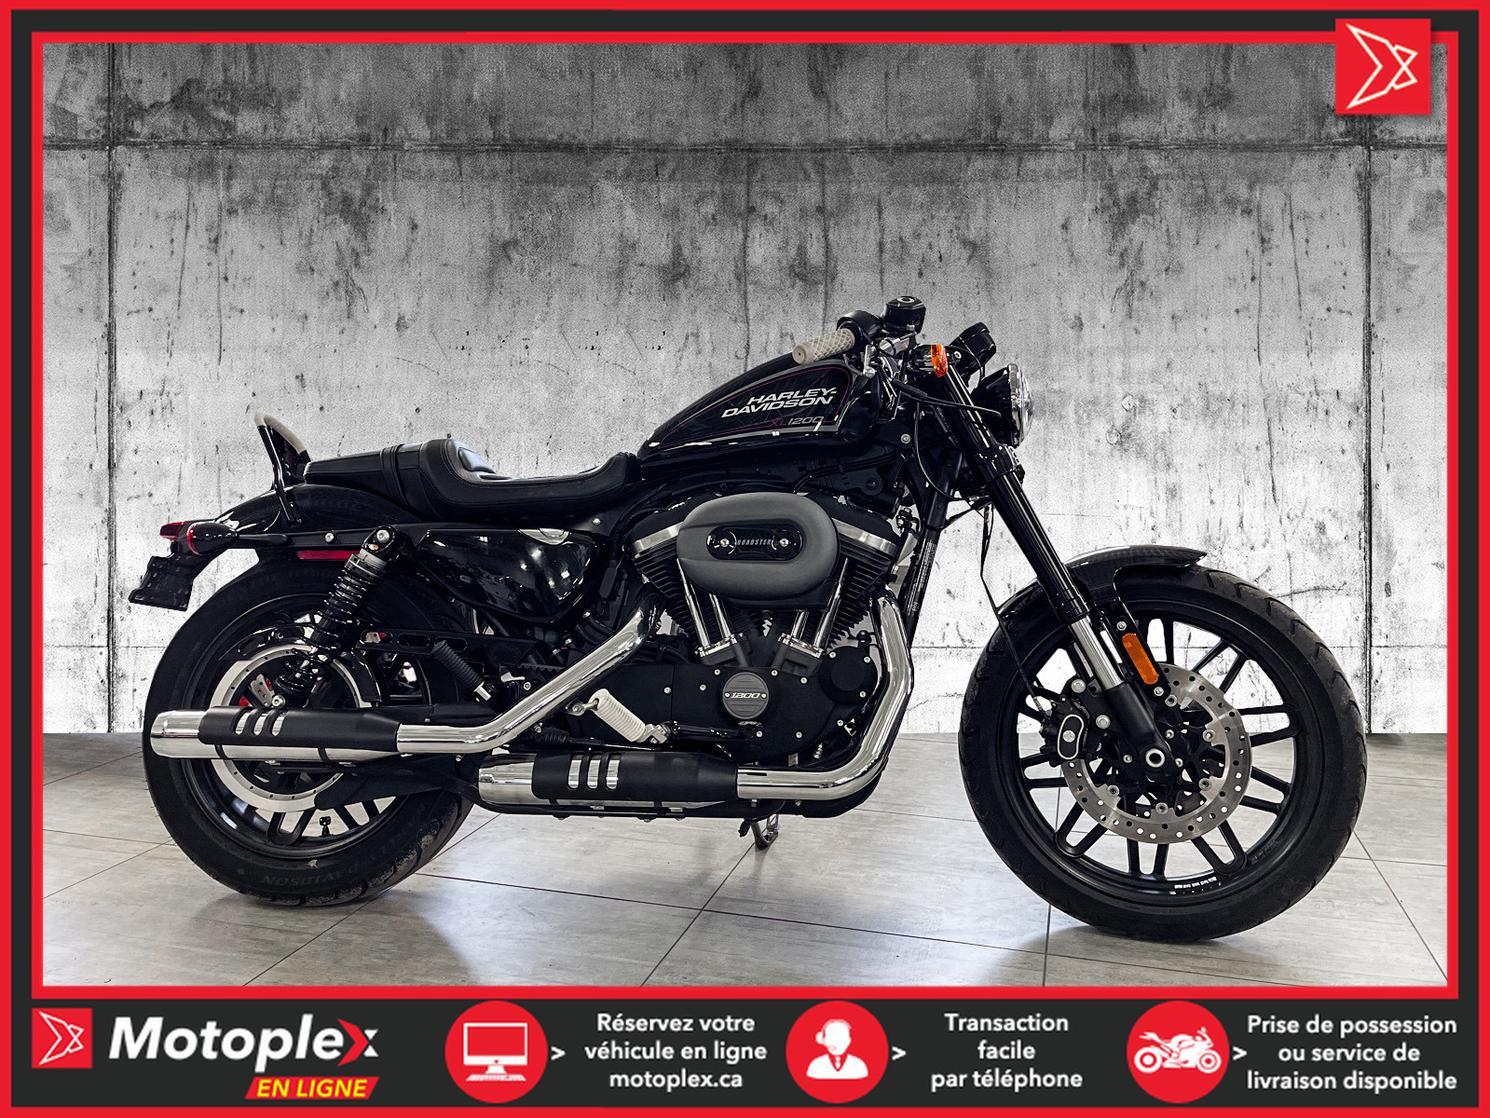 U5112 2019 Harley-Davidson SPORTSTER 1200 ROADSTER XL1200CX